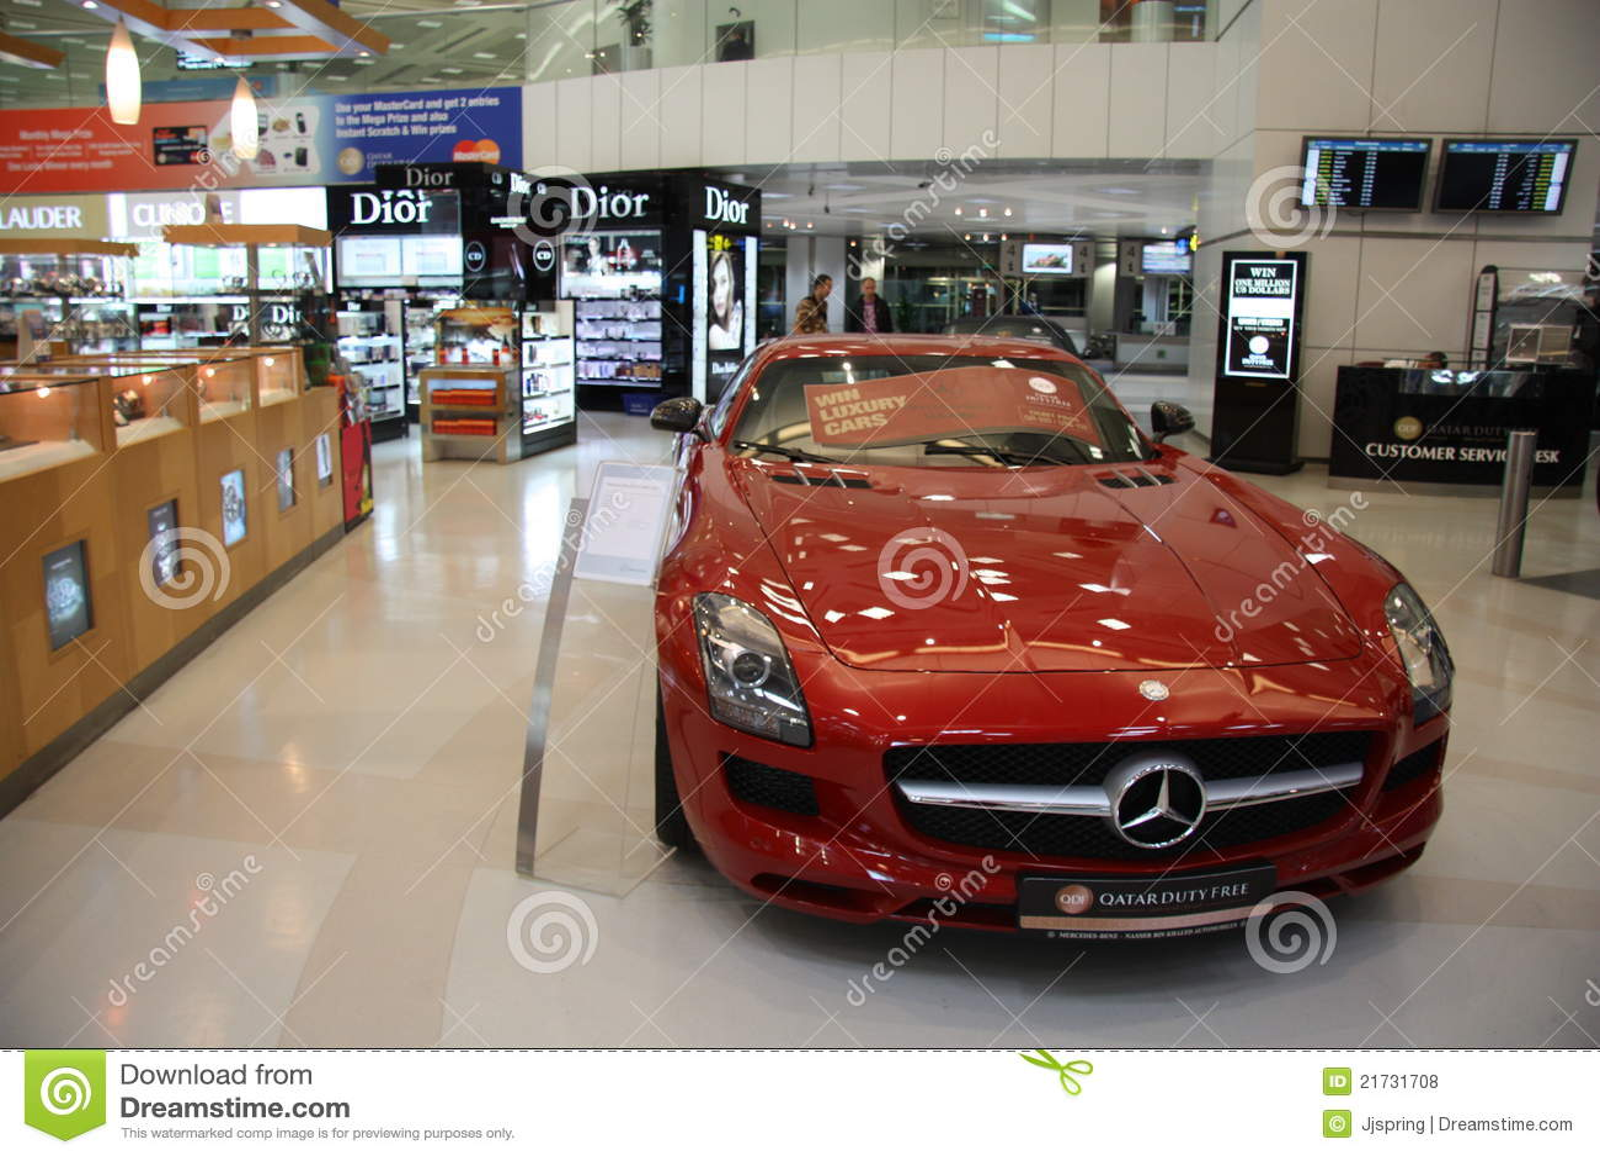 Aeroporto Qatar : Loja isenta de direitos aduaneiros no aeroporto doha